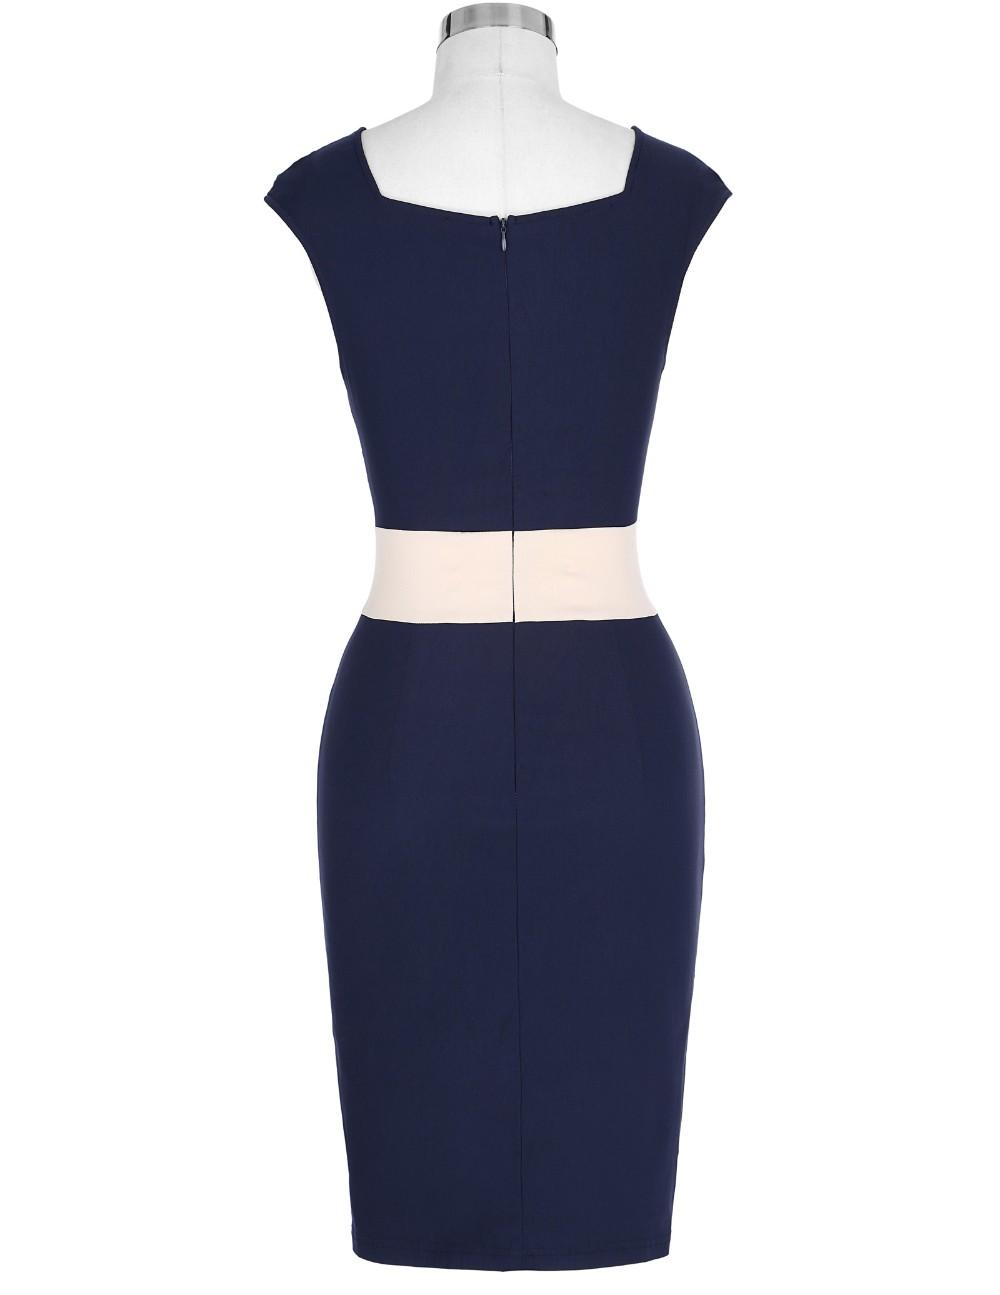 Retro Vintage Sleeveless Crew Neck 2017 Sexy Hollowed Back Cotton Navy Blue Party Dresses Vestidos Casual Office Bodycon Dress 9